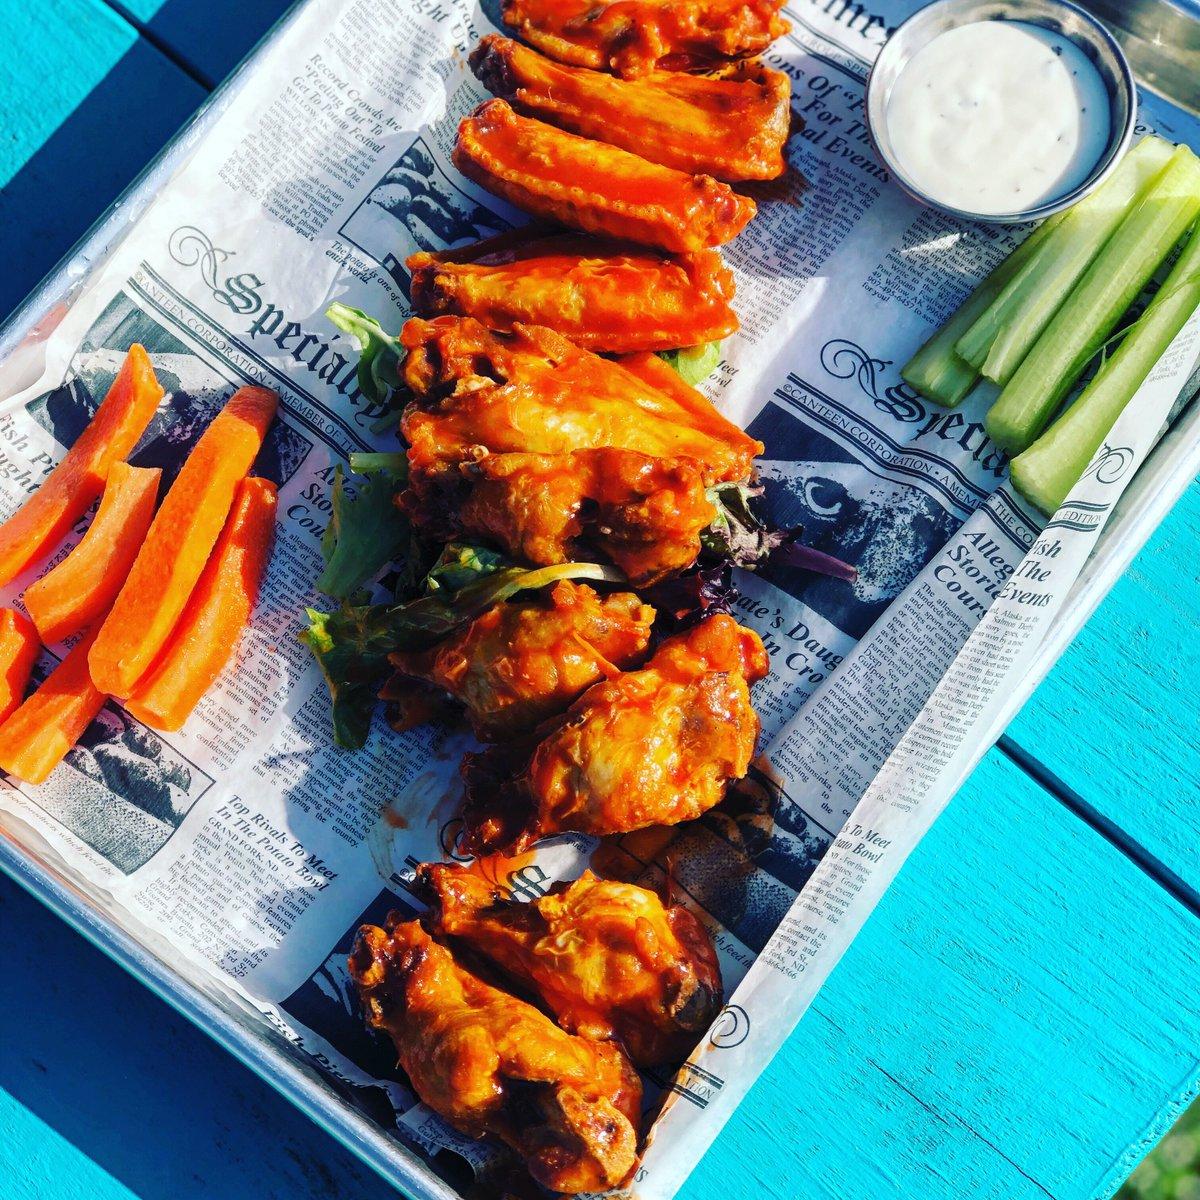 Wing Wednesday! $.60 wings! Orders of 10 or 20. BBQ, Buffalo, Jerk, Lemon Pepper, or Teriyaki.